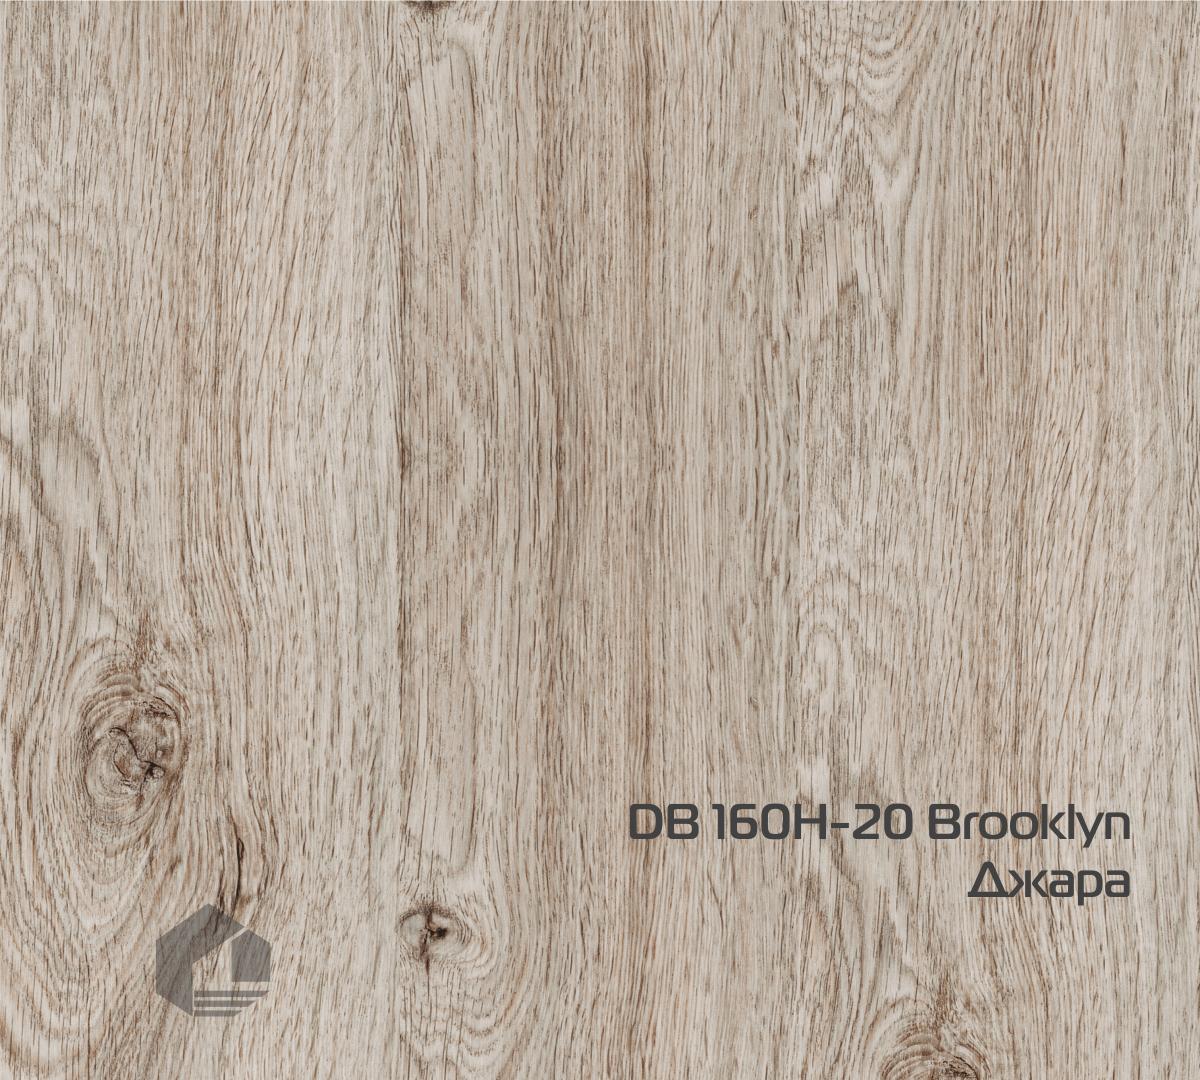 Кварцвиниловая плитка Wonderful Vinyl Floor Brooklyn DB-160H-20